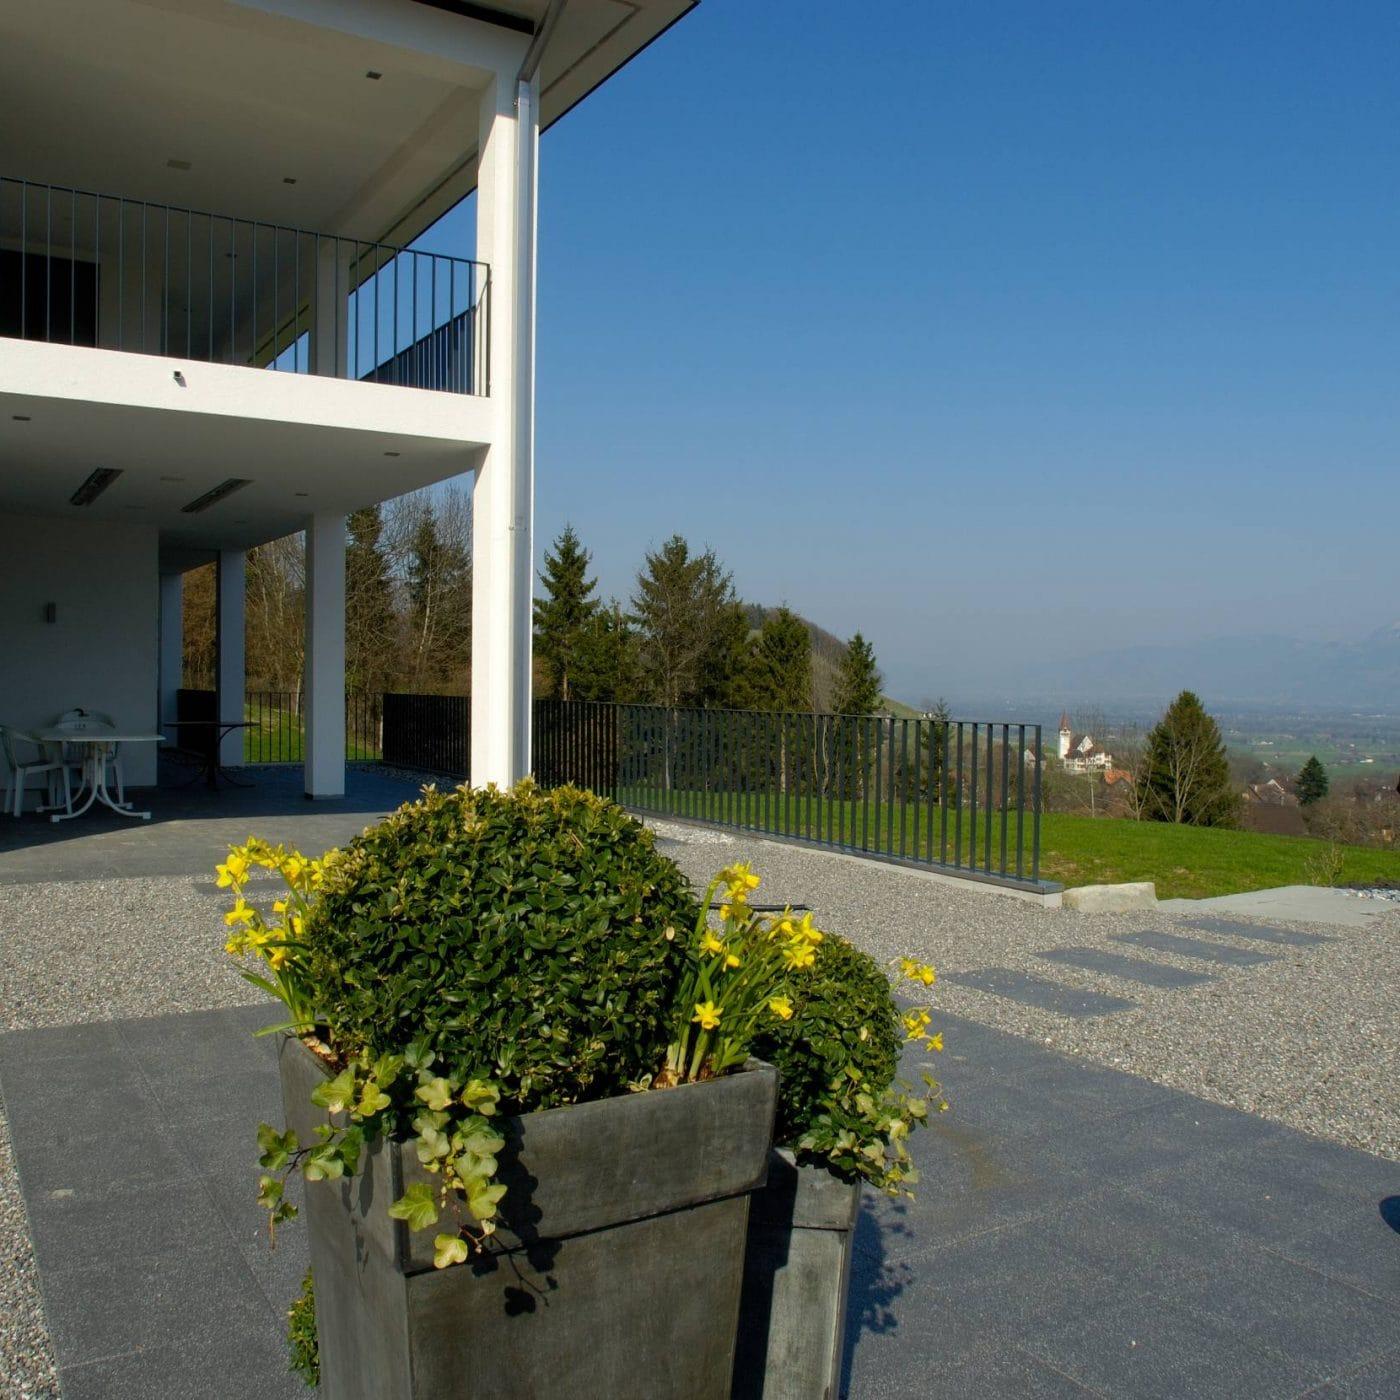 Eichberg Badstrasse Umgebung